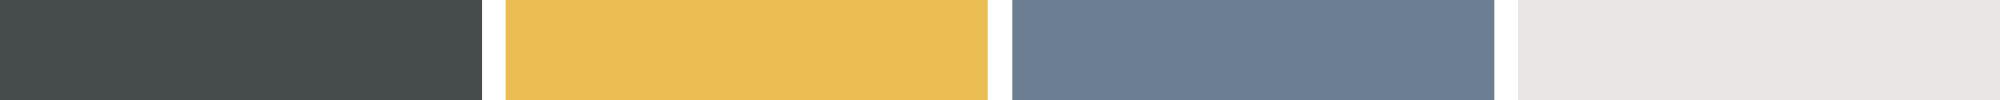 LizGoodman-Colors.jpg